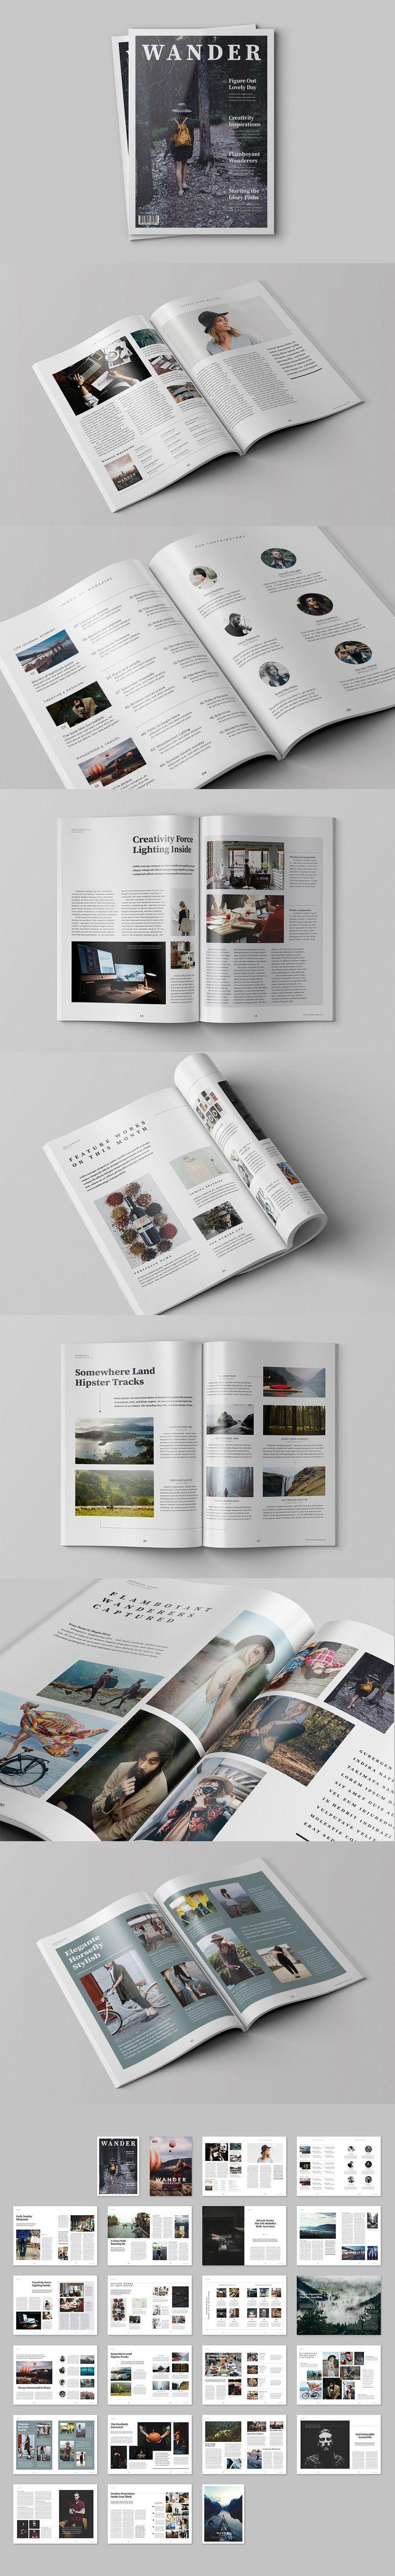 144 best Magazine | Grids & Templates images on Pinterest ...